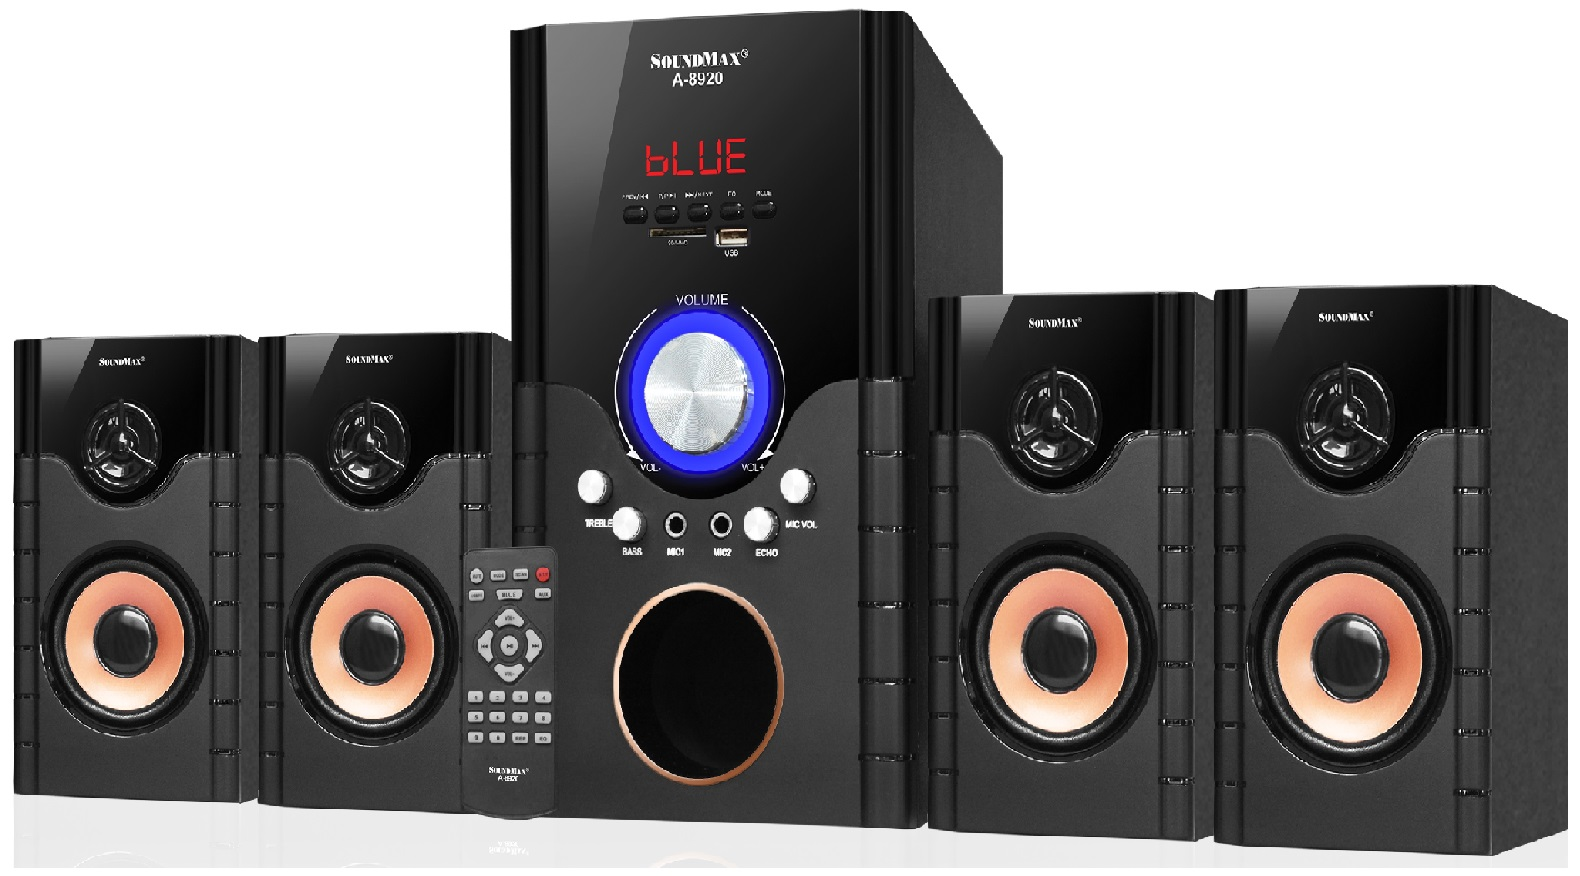 LOA SOUND MAX A8920 (4.1)